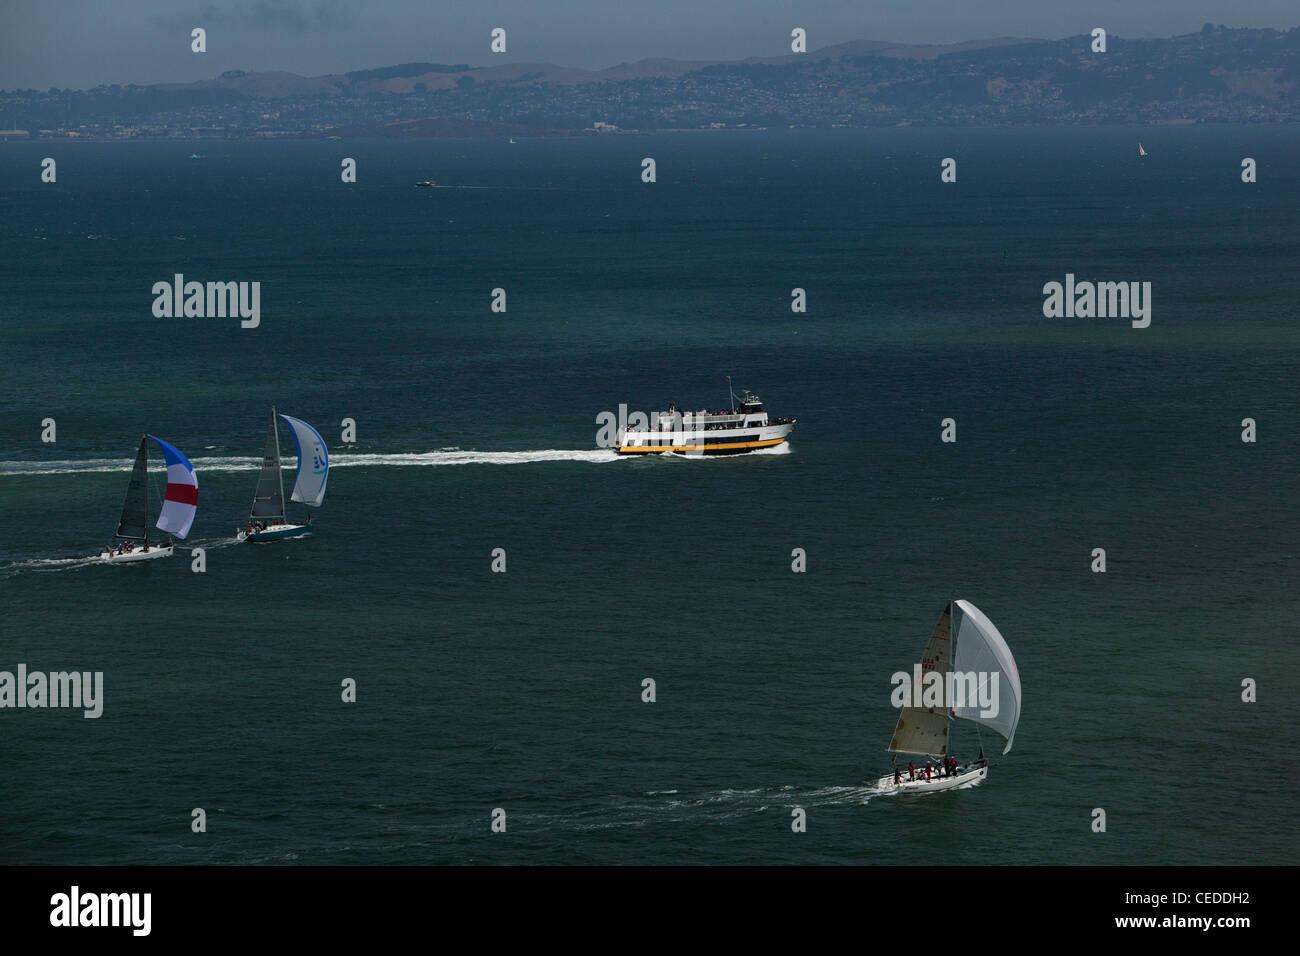 aerial photograph Rolex Big Boat Series sailboat regatta San Francisco bay California - Stock Image